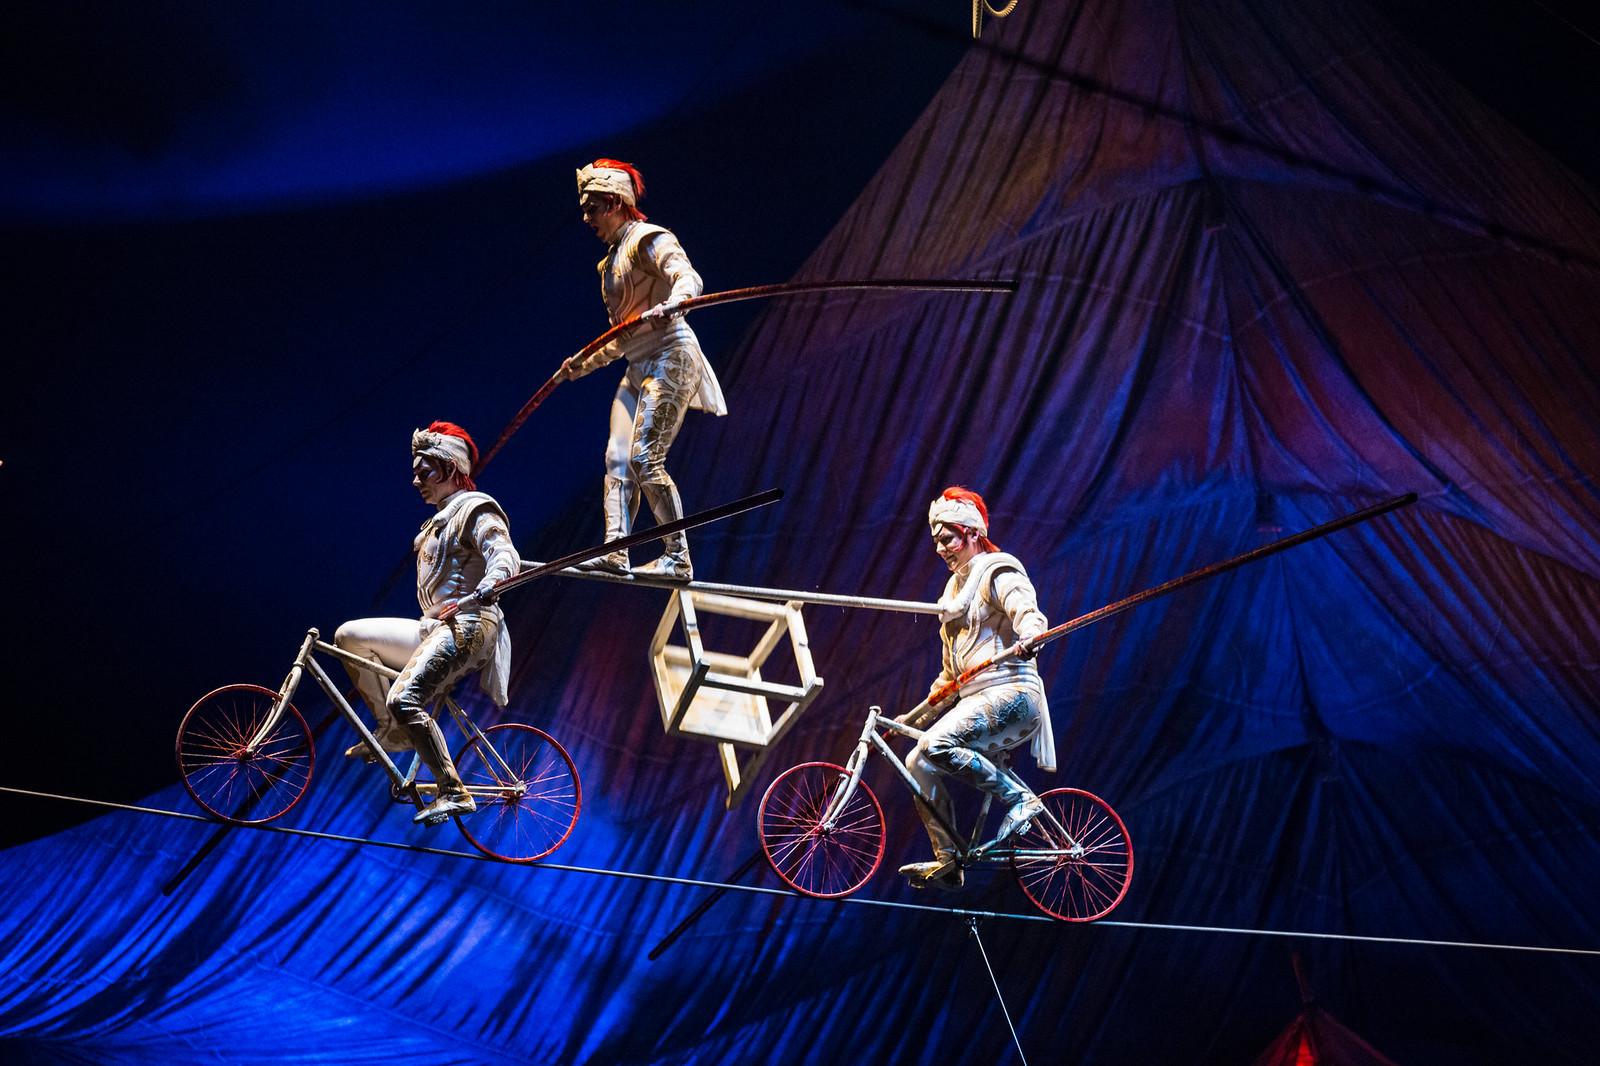 HighWire_Bicycle | Photos: Matt Beard Costumes: Marie-Chantale Vaillancourt ©2012 Cirque du Soleil